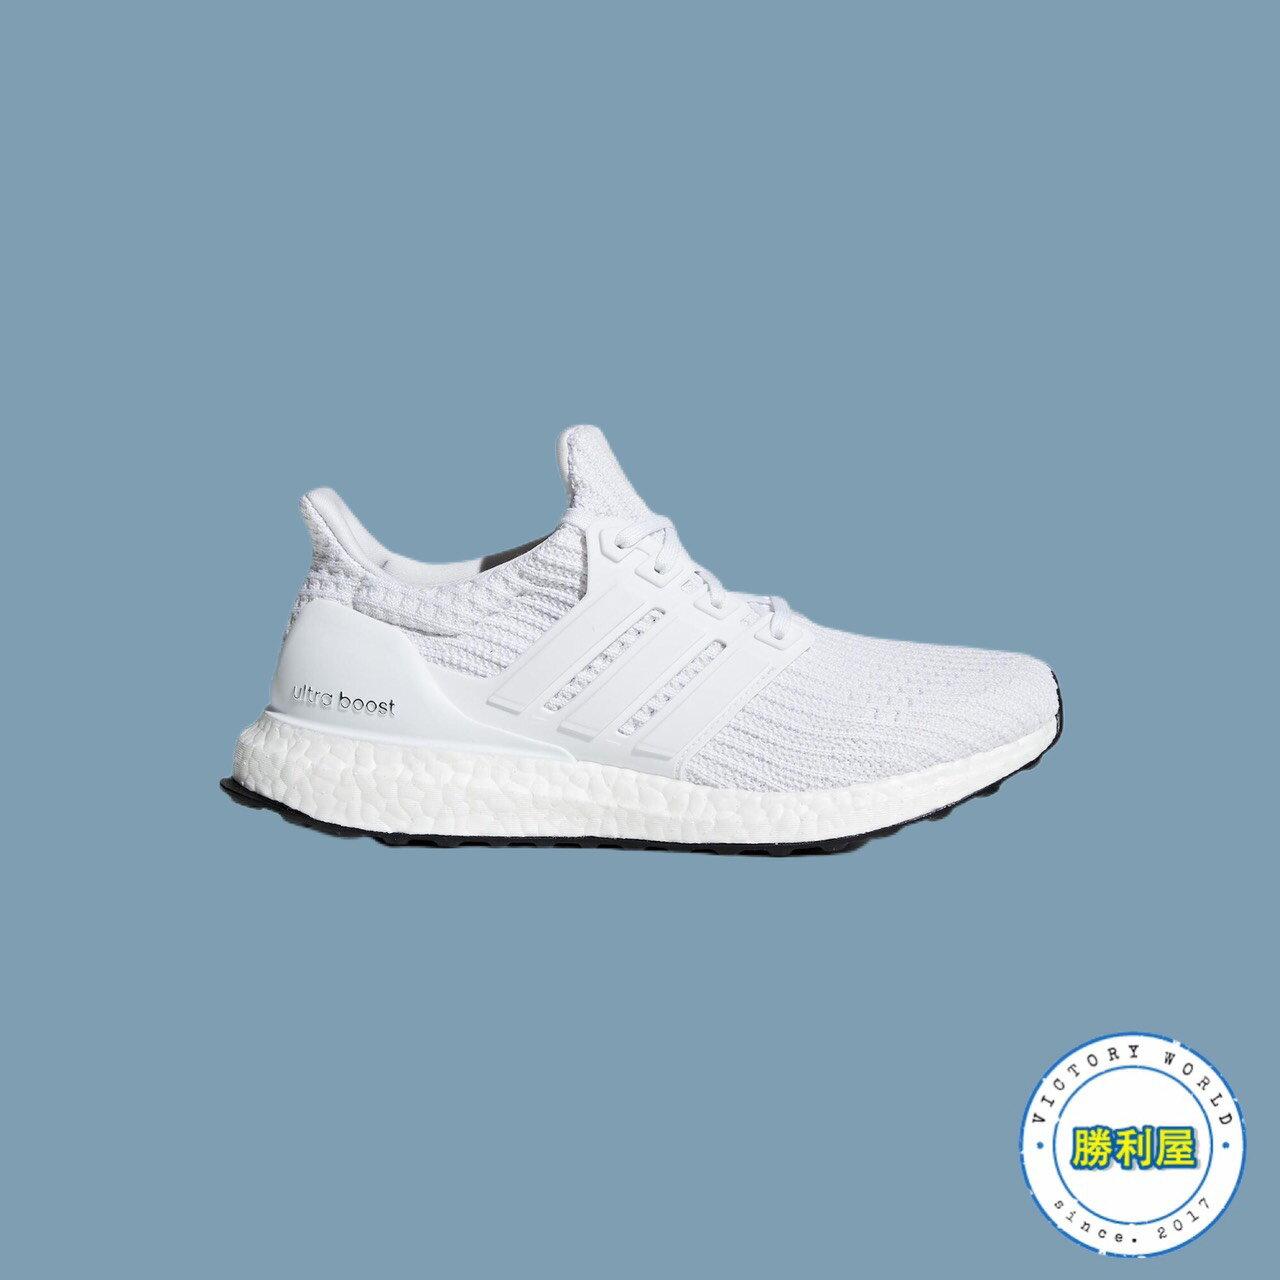 【ADIDAS】ULTRA BOOST 4.0 男鞋 休閒鞋 運動鞋 全白 BOOST 熱門款 BB6308【勝利屋】